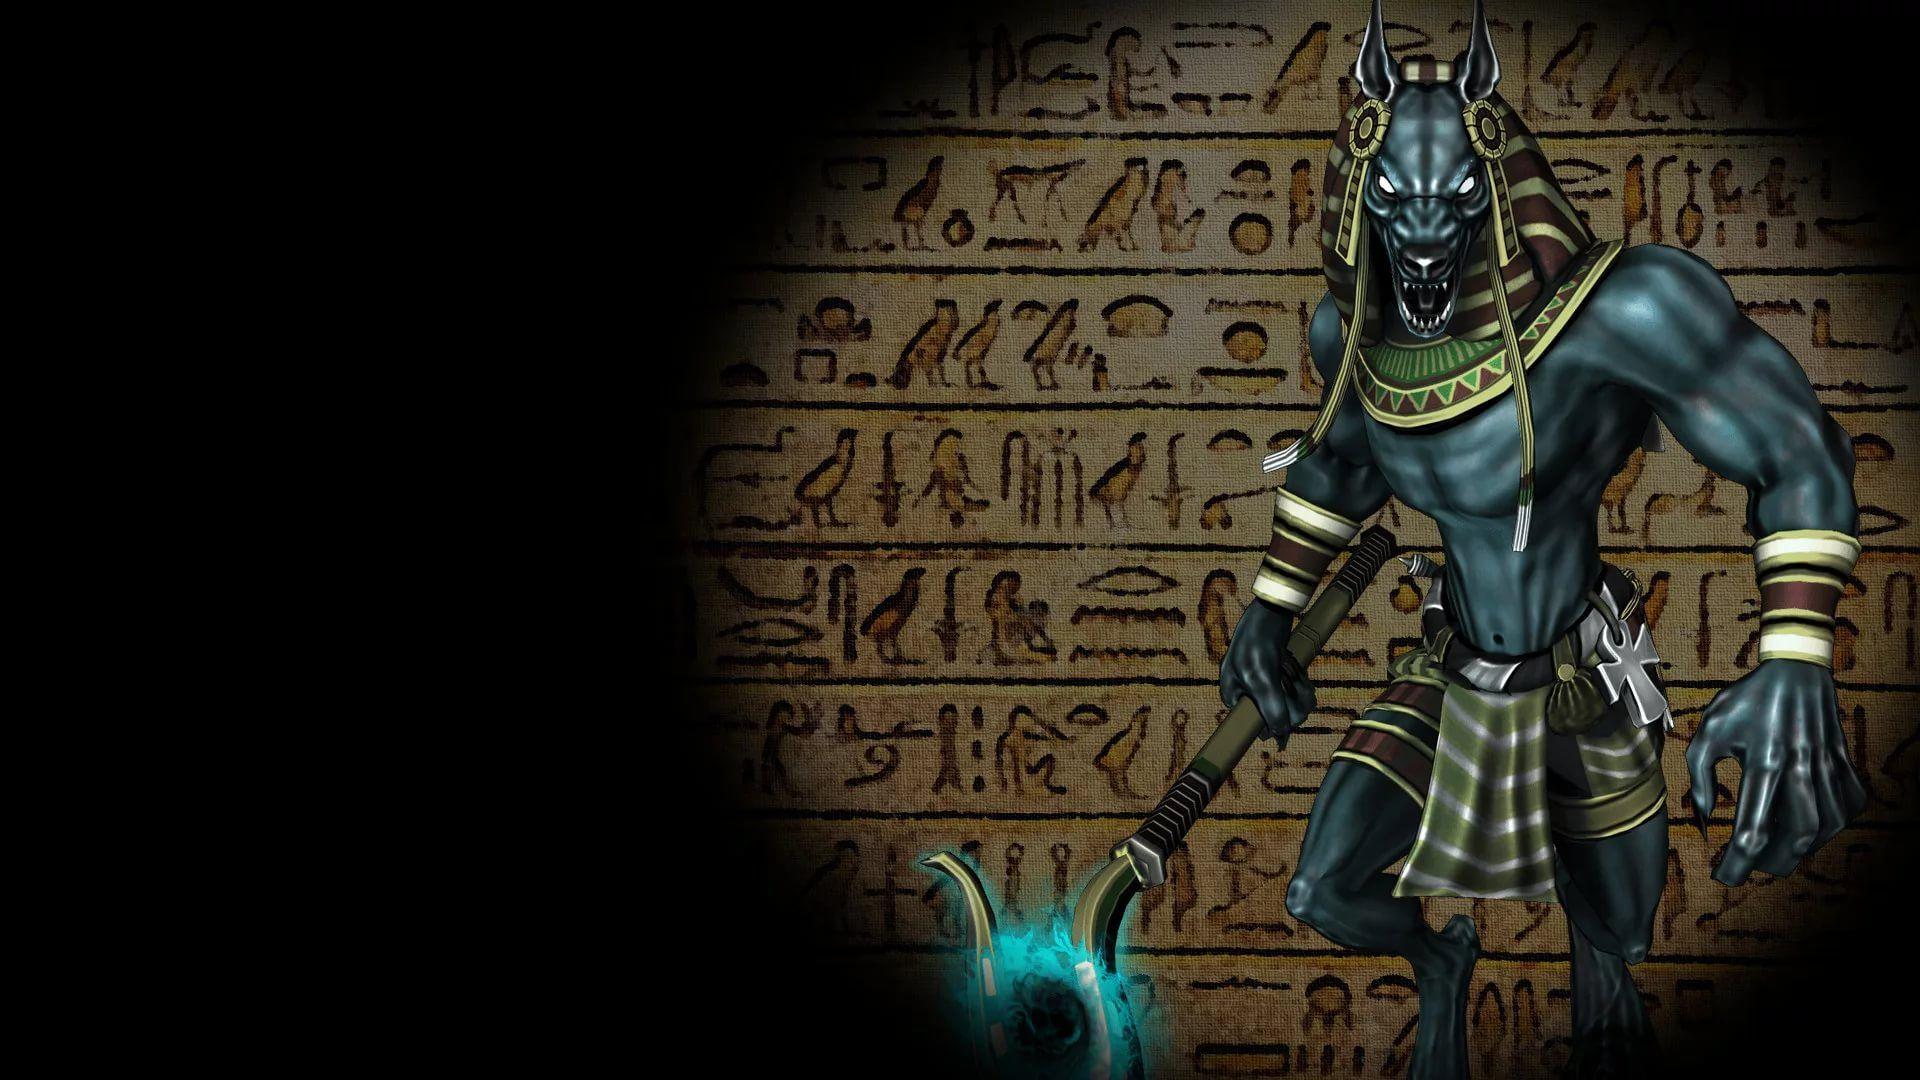 Cool Egyptian screen wallpaper